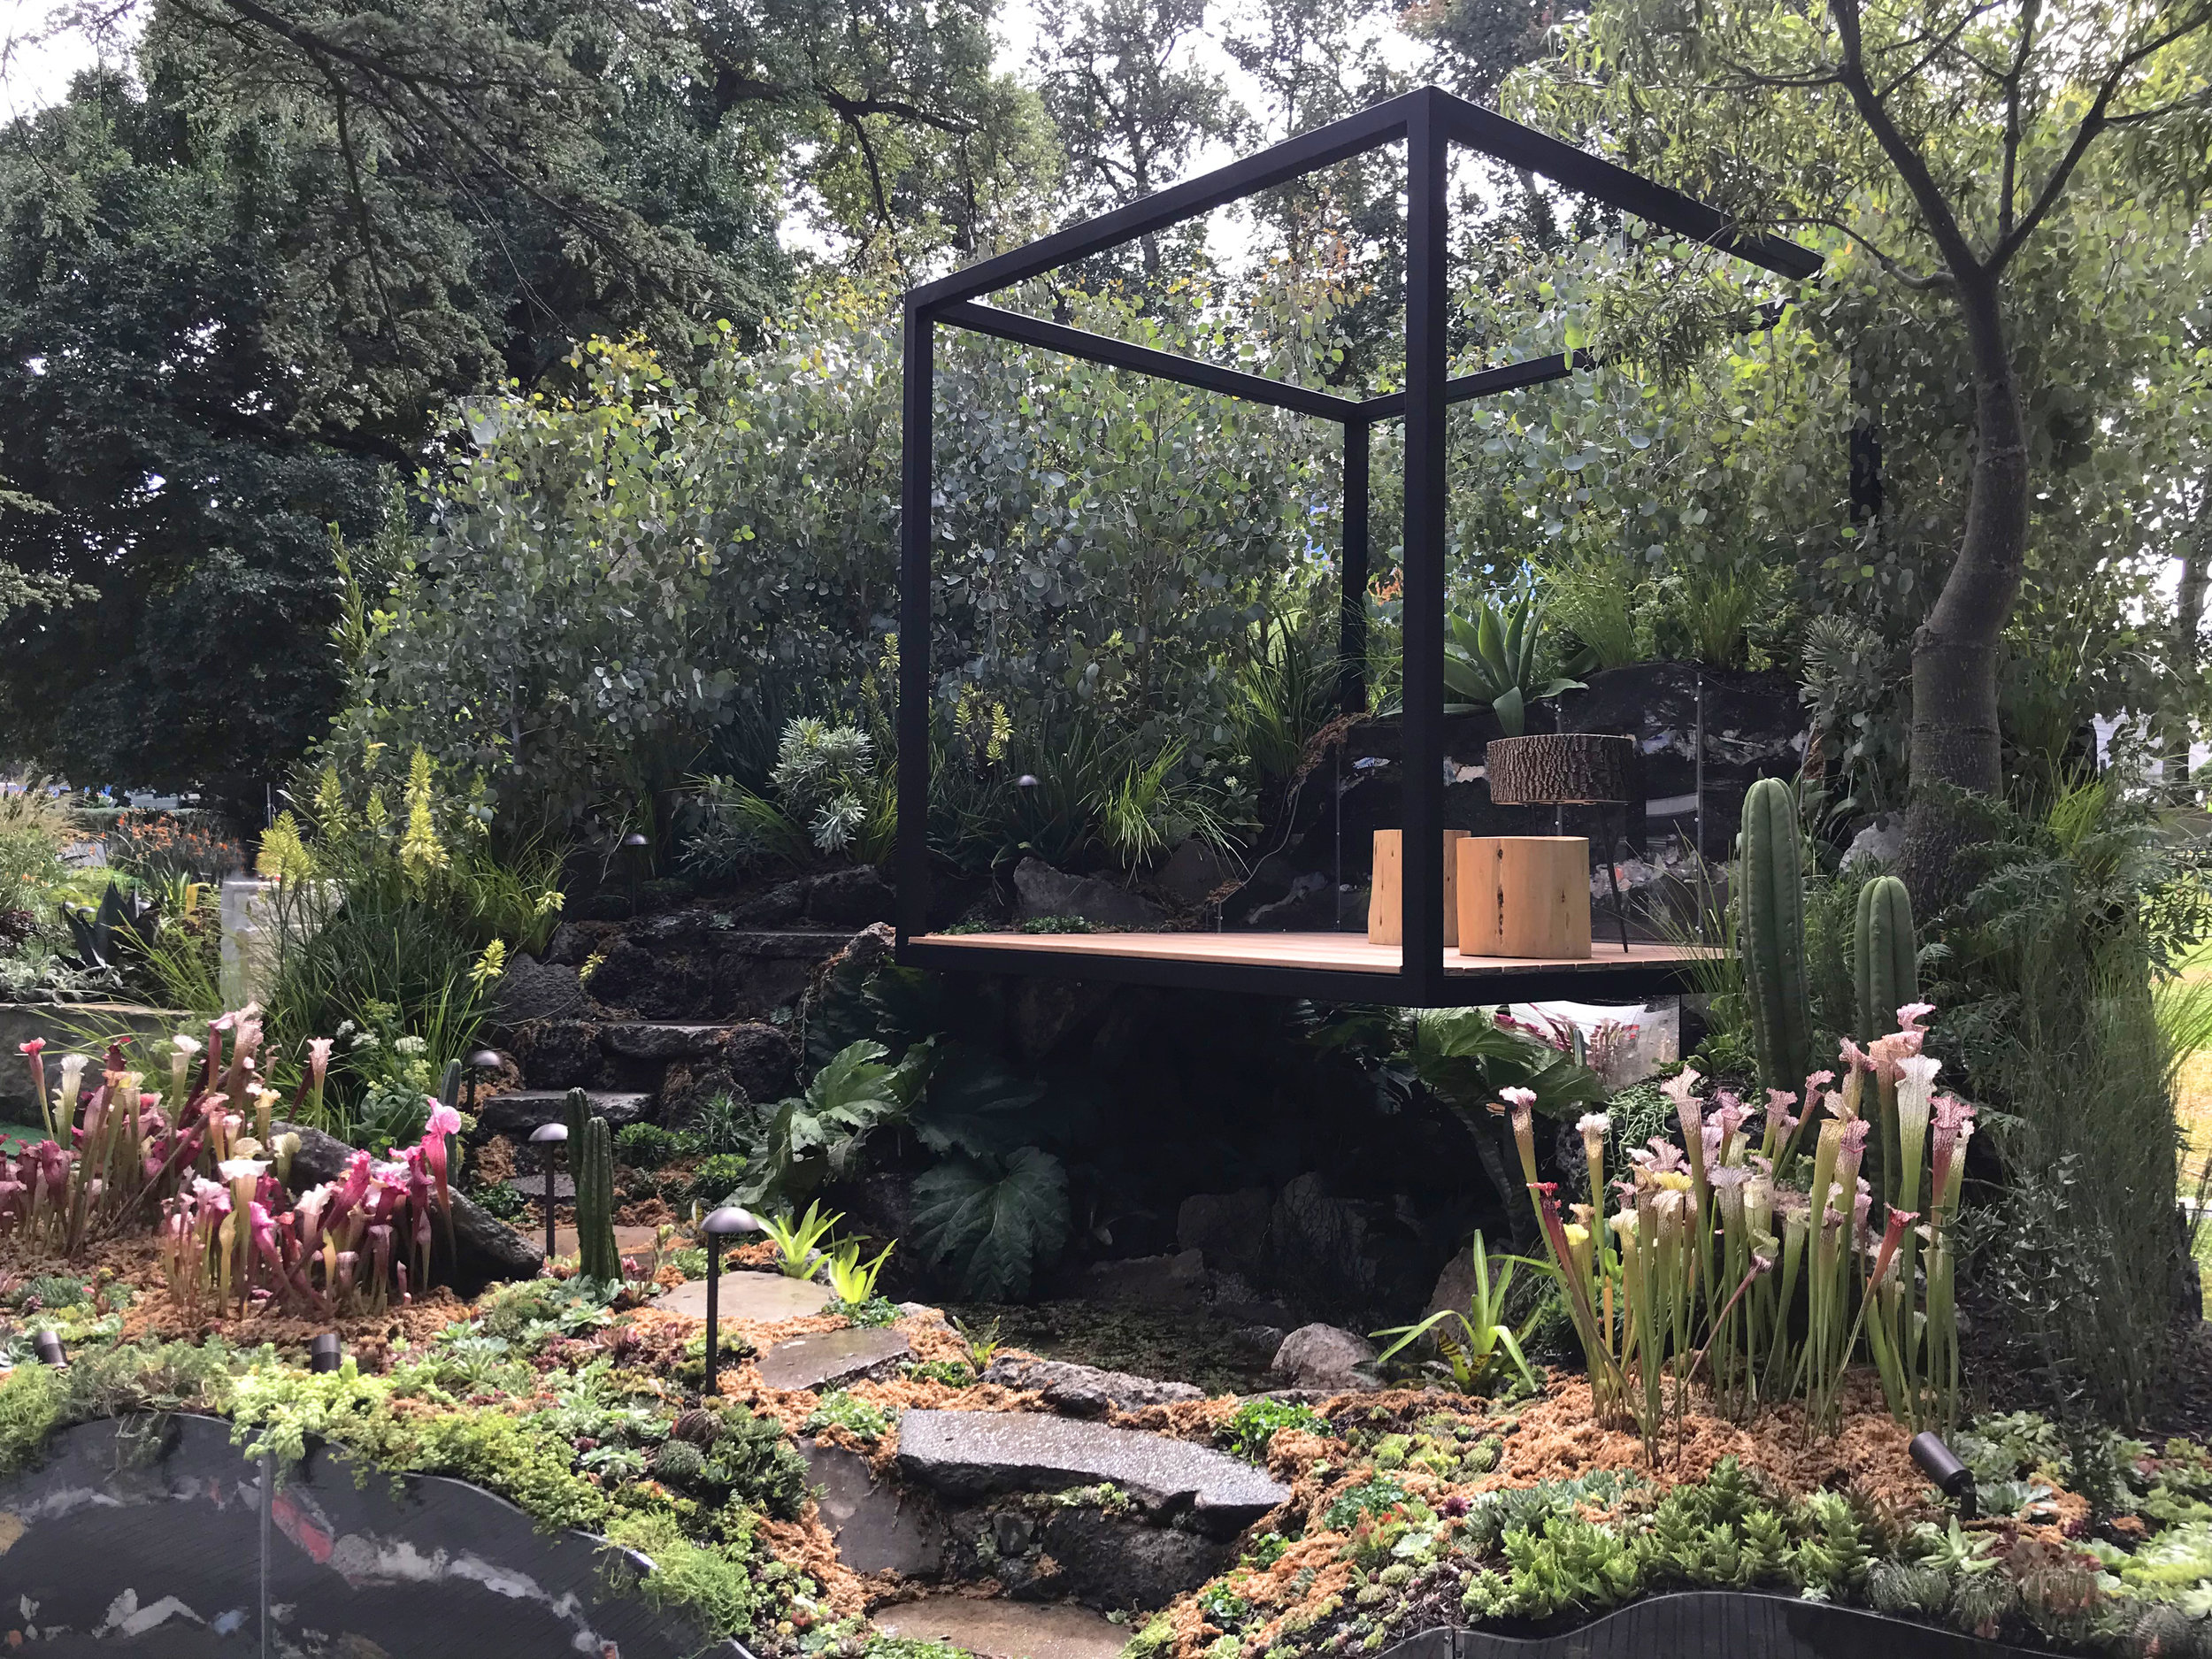 MIFGS - Melbourne International Flower and Garden Show — Landscape